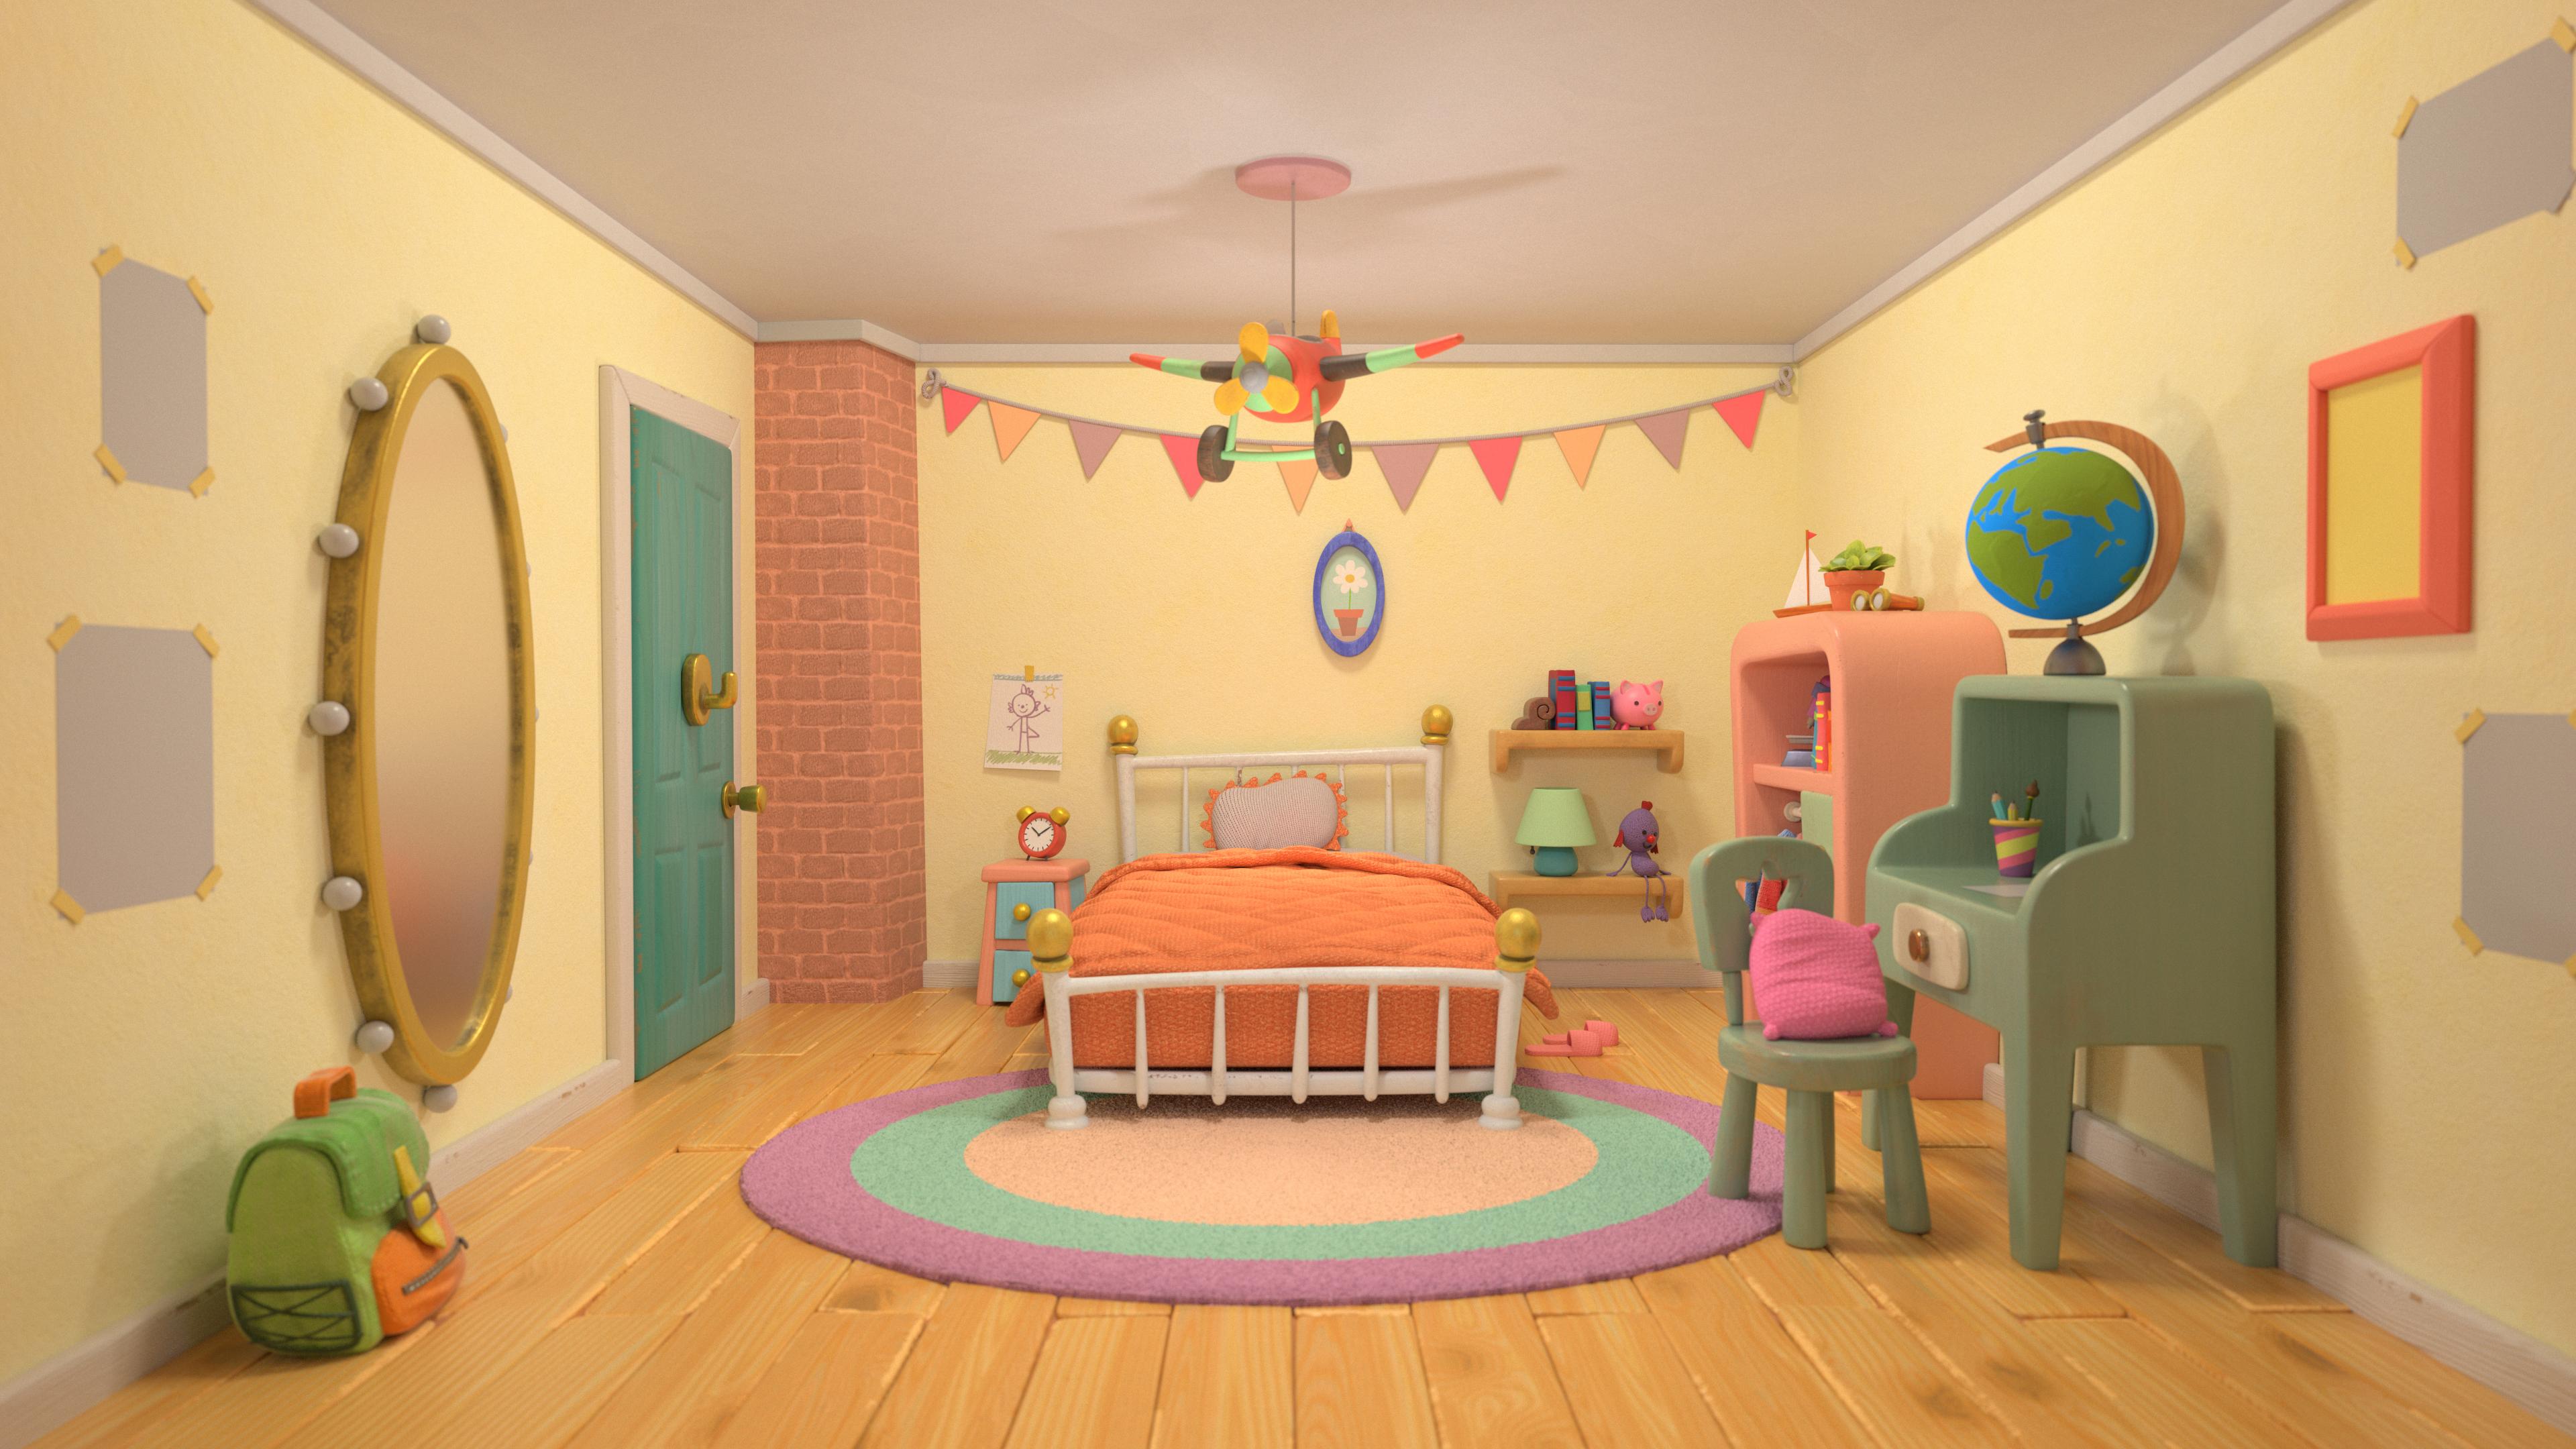 Jessys_Room_A